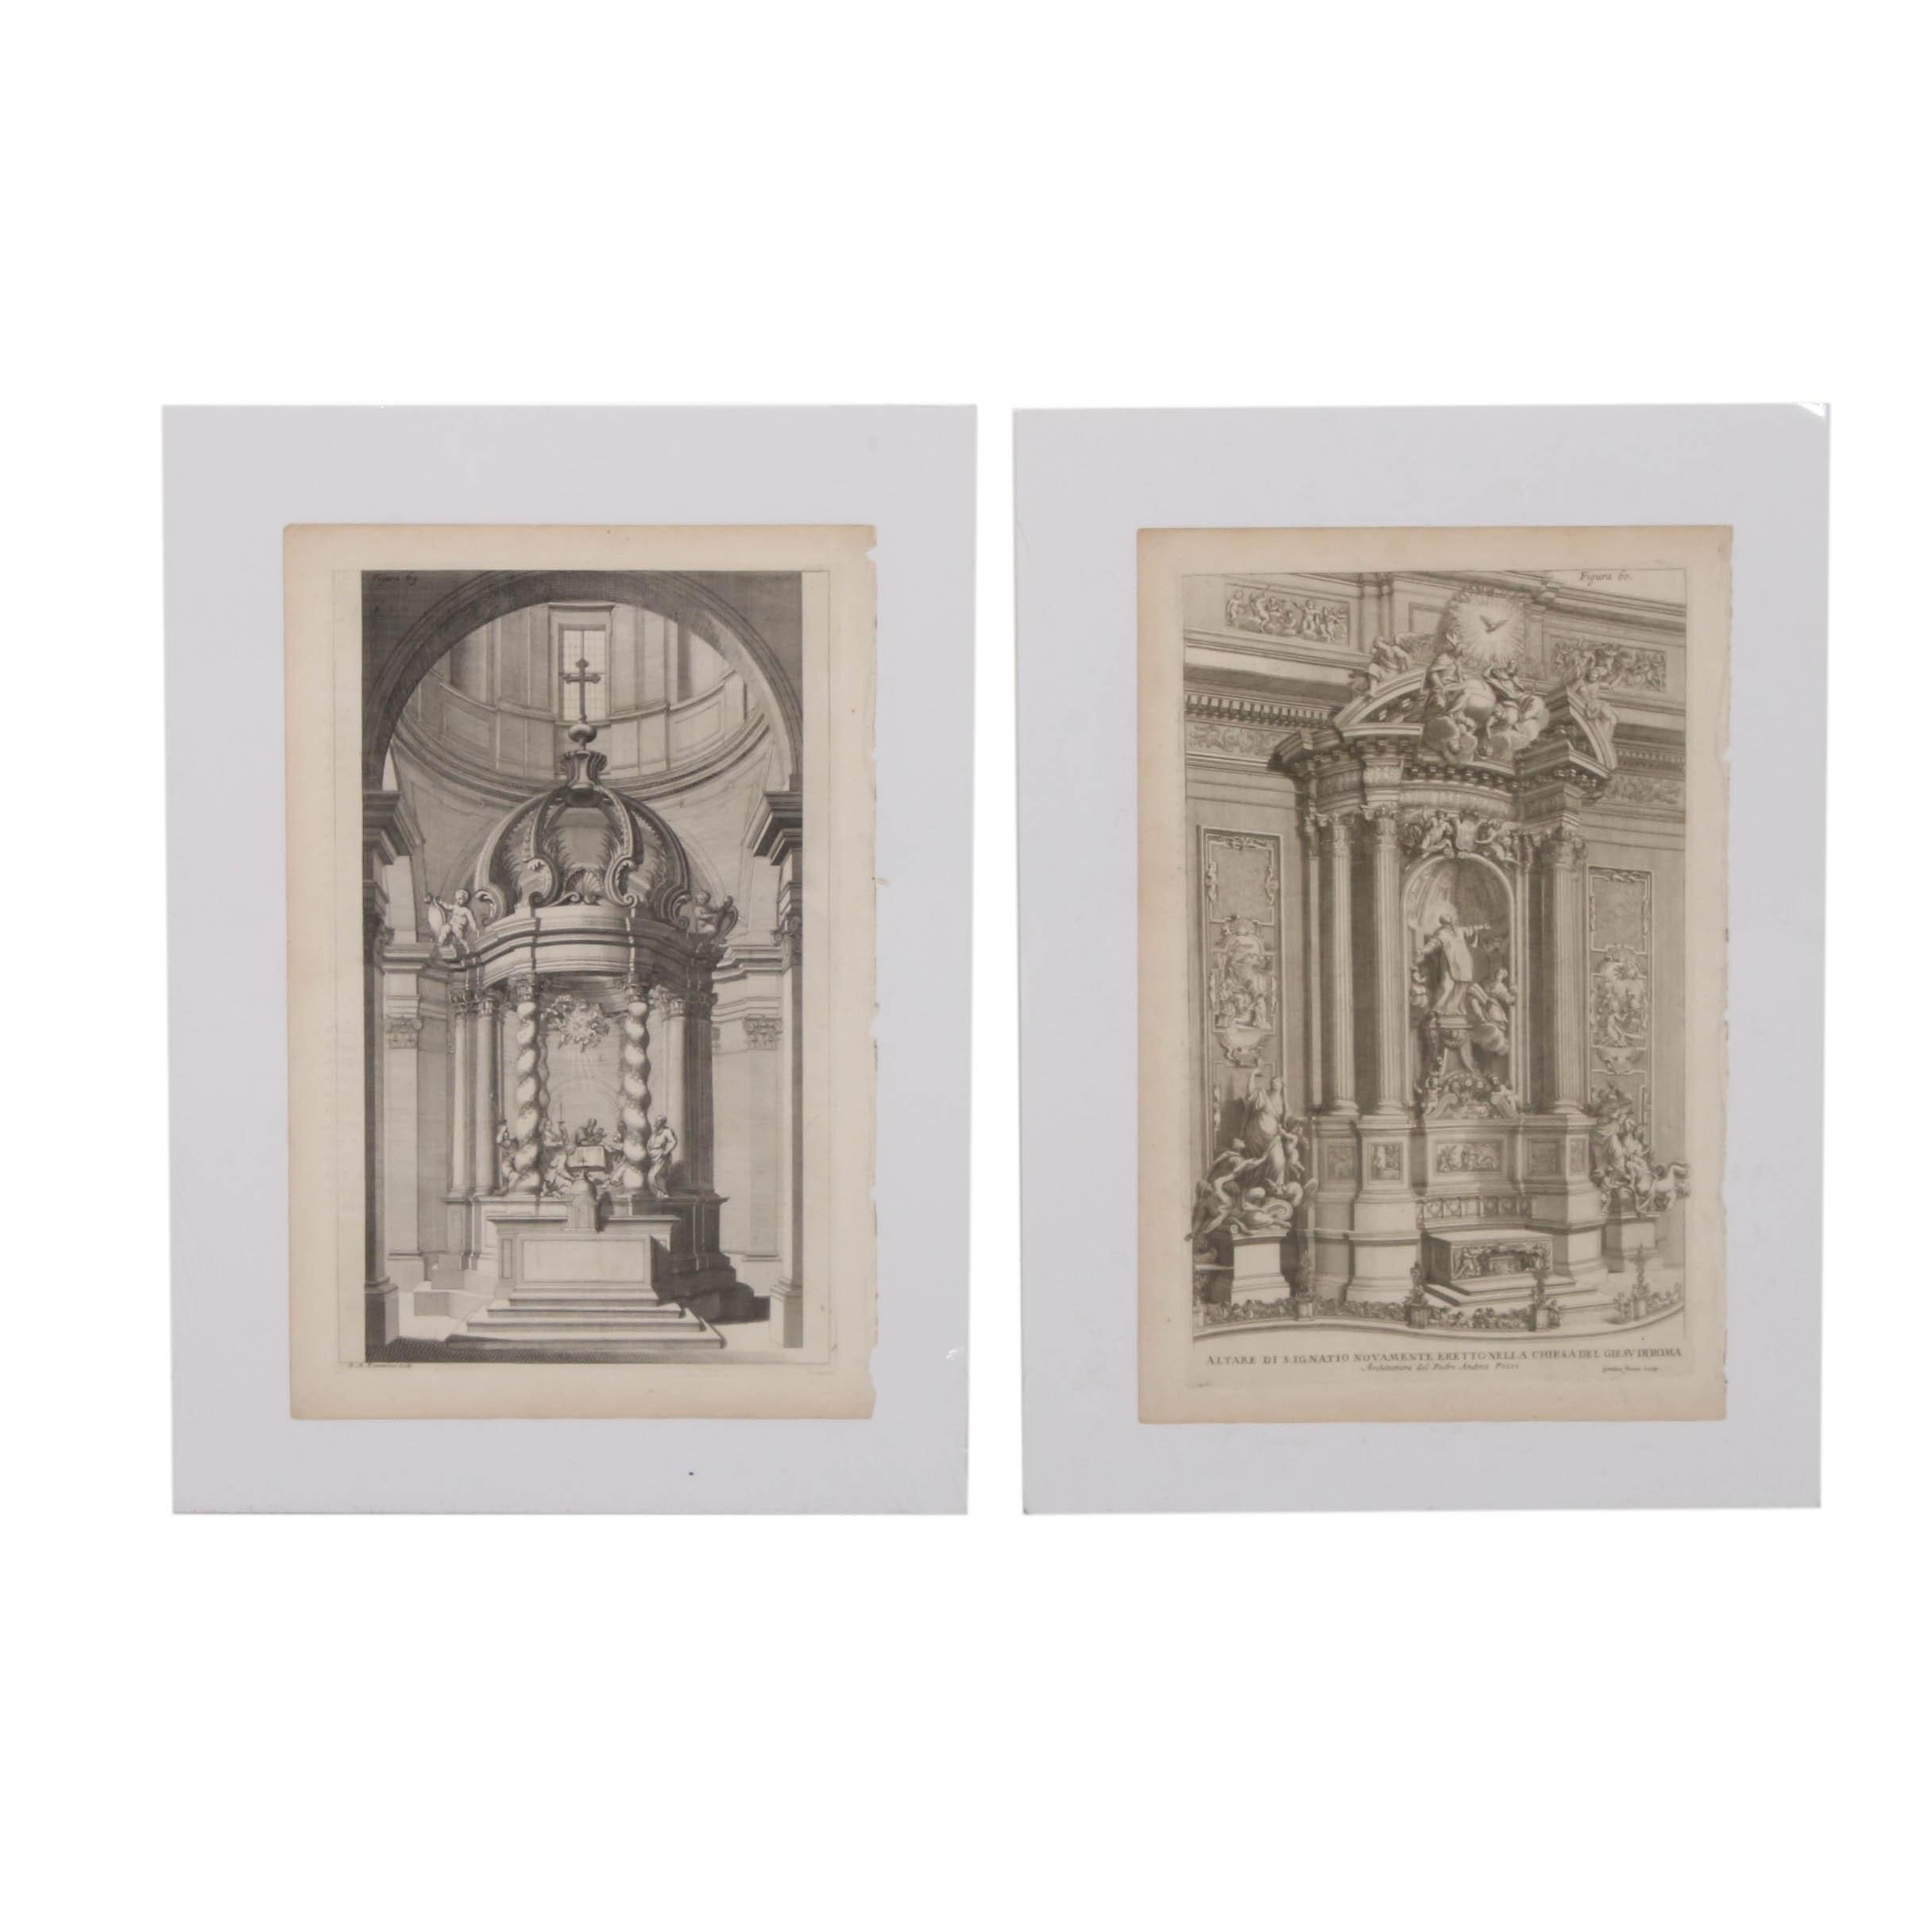 Etchings after Giovanni Girolamo Frezza and Domenico Mariano Franceschini